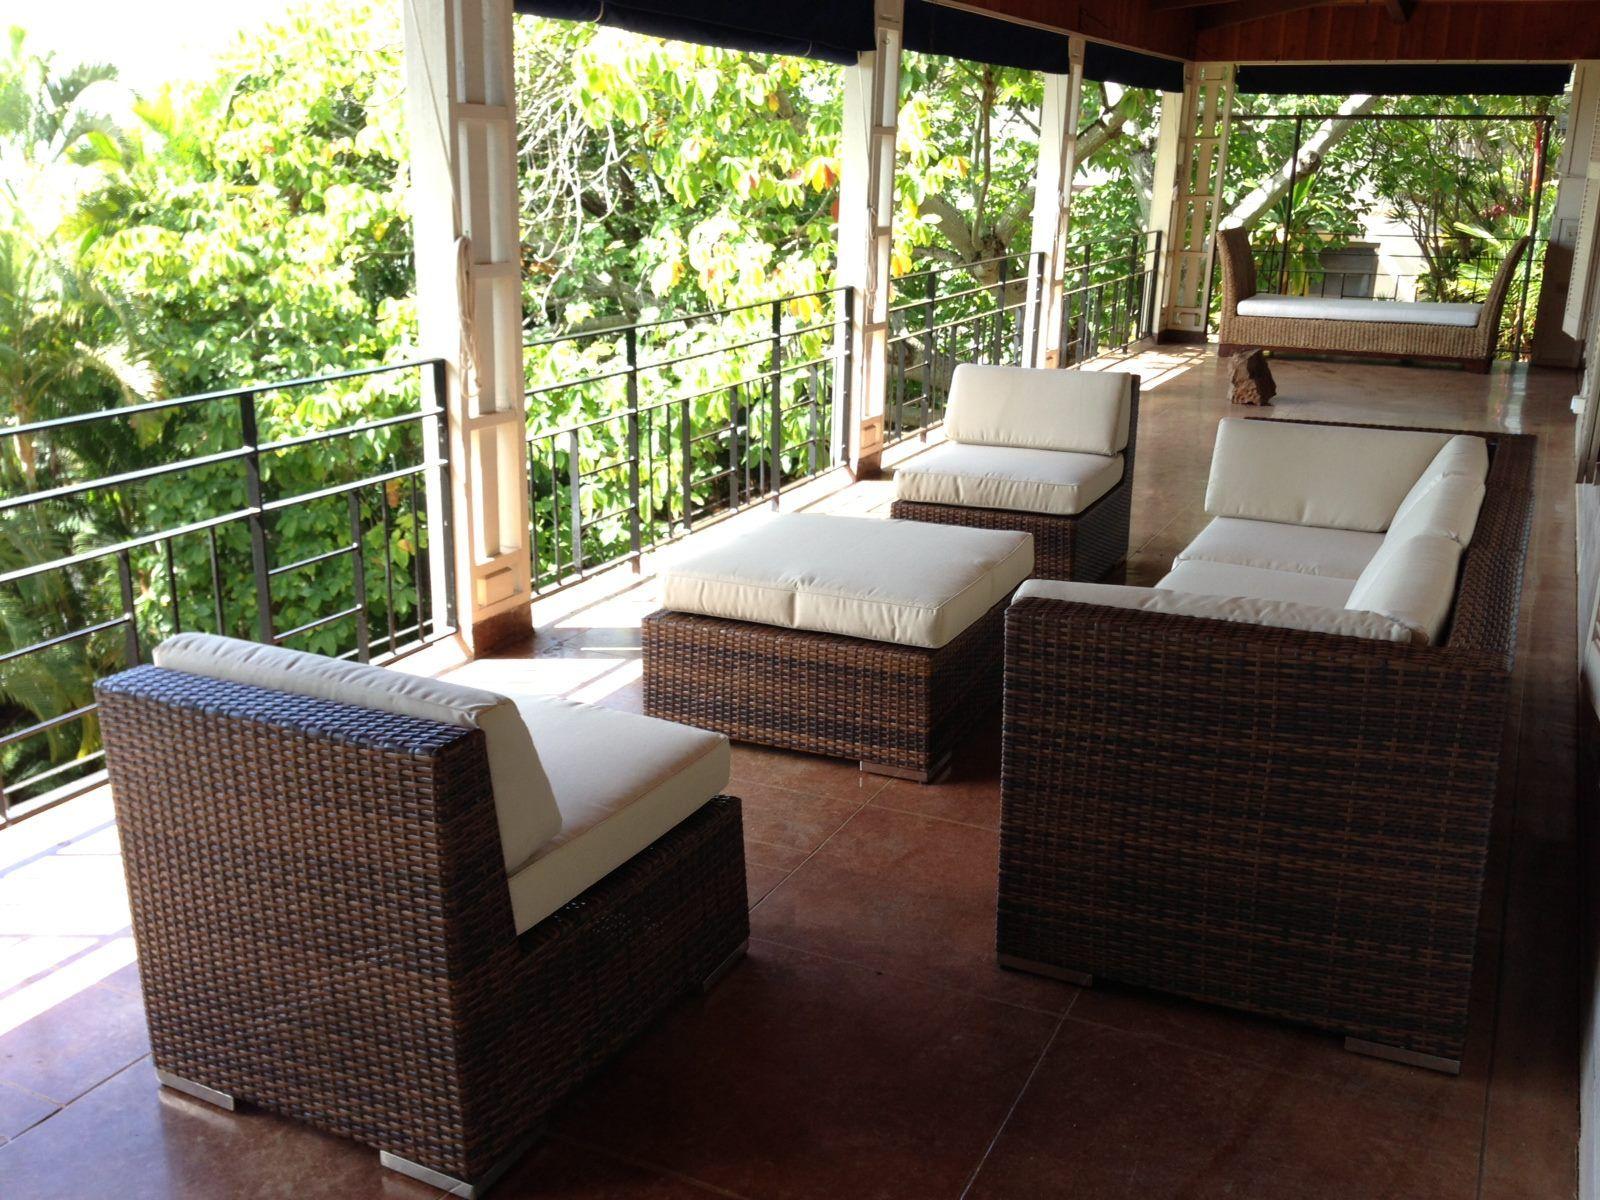 Ohana Wicker Furniture Outdoor Patio Furniture Deep Seating Set / Ohana  Depot